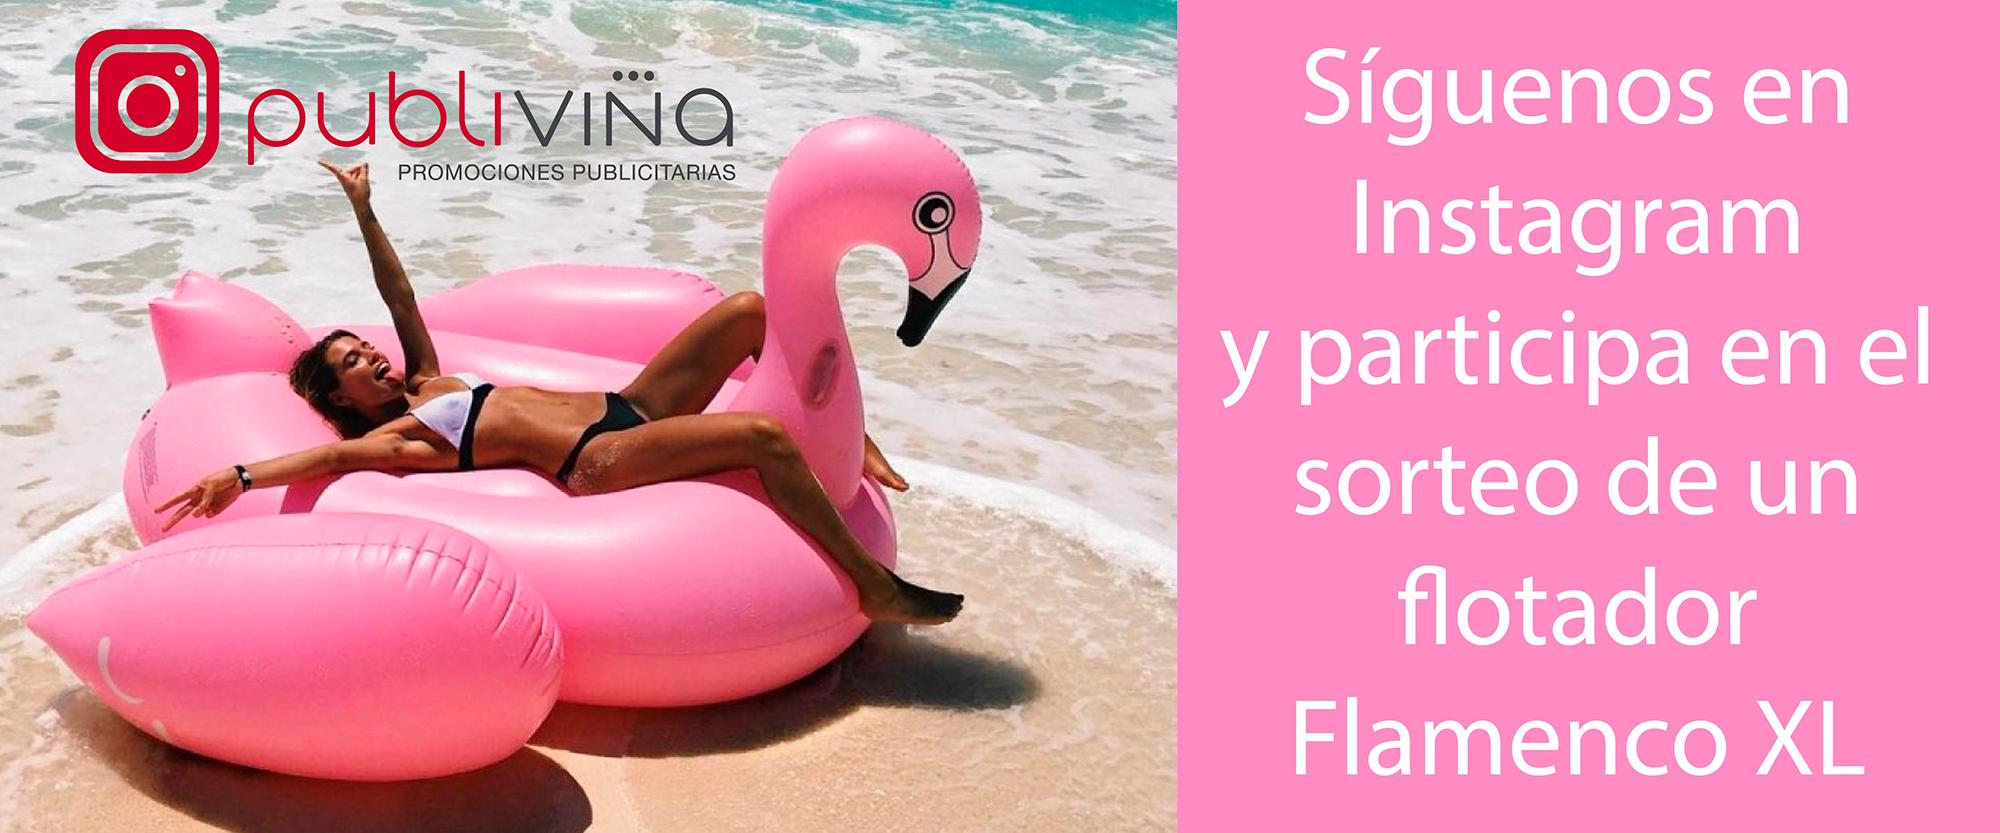 Concurso Instagram Flotador Flamenco XL Publiviña